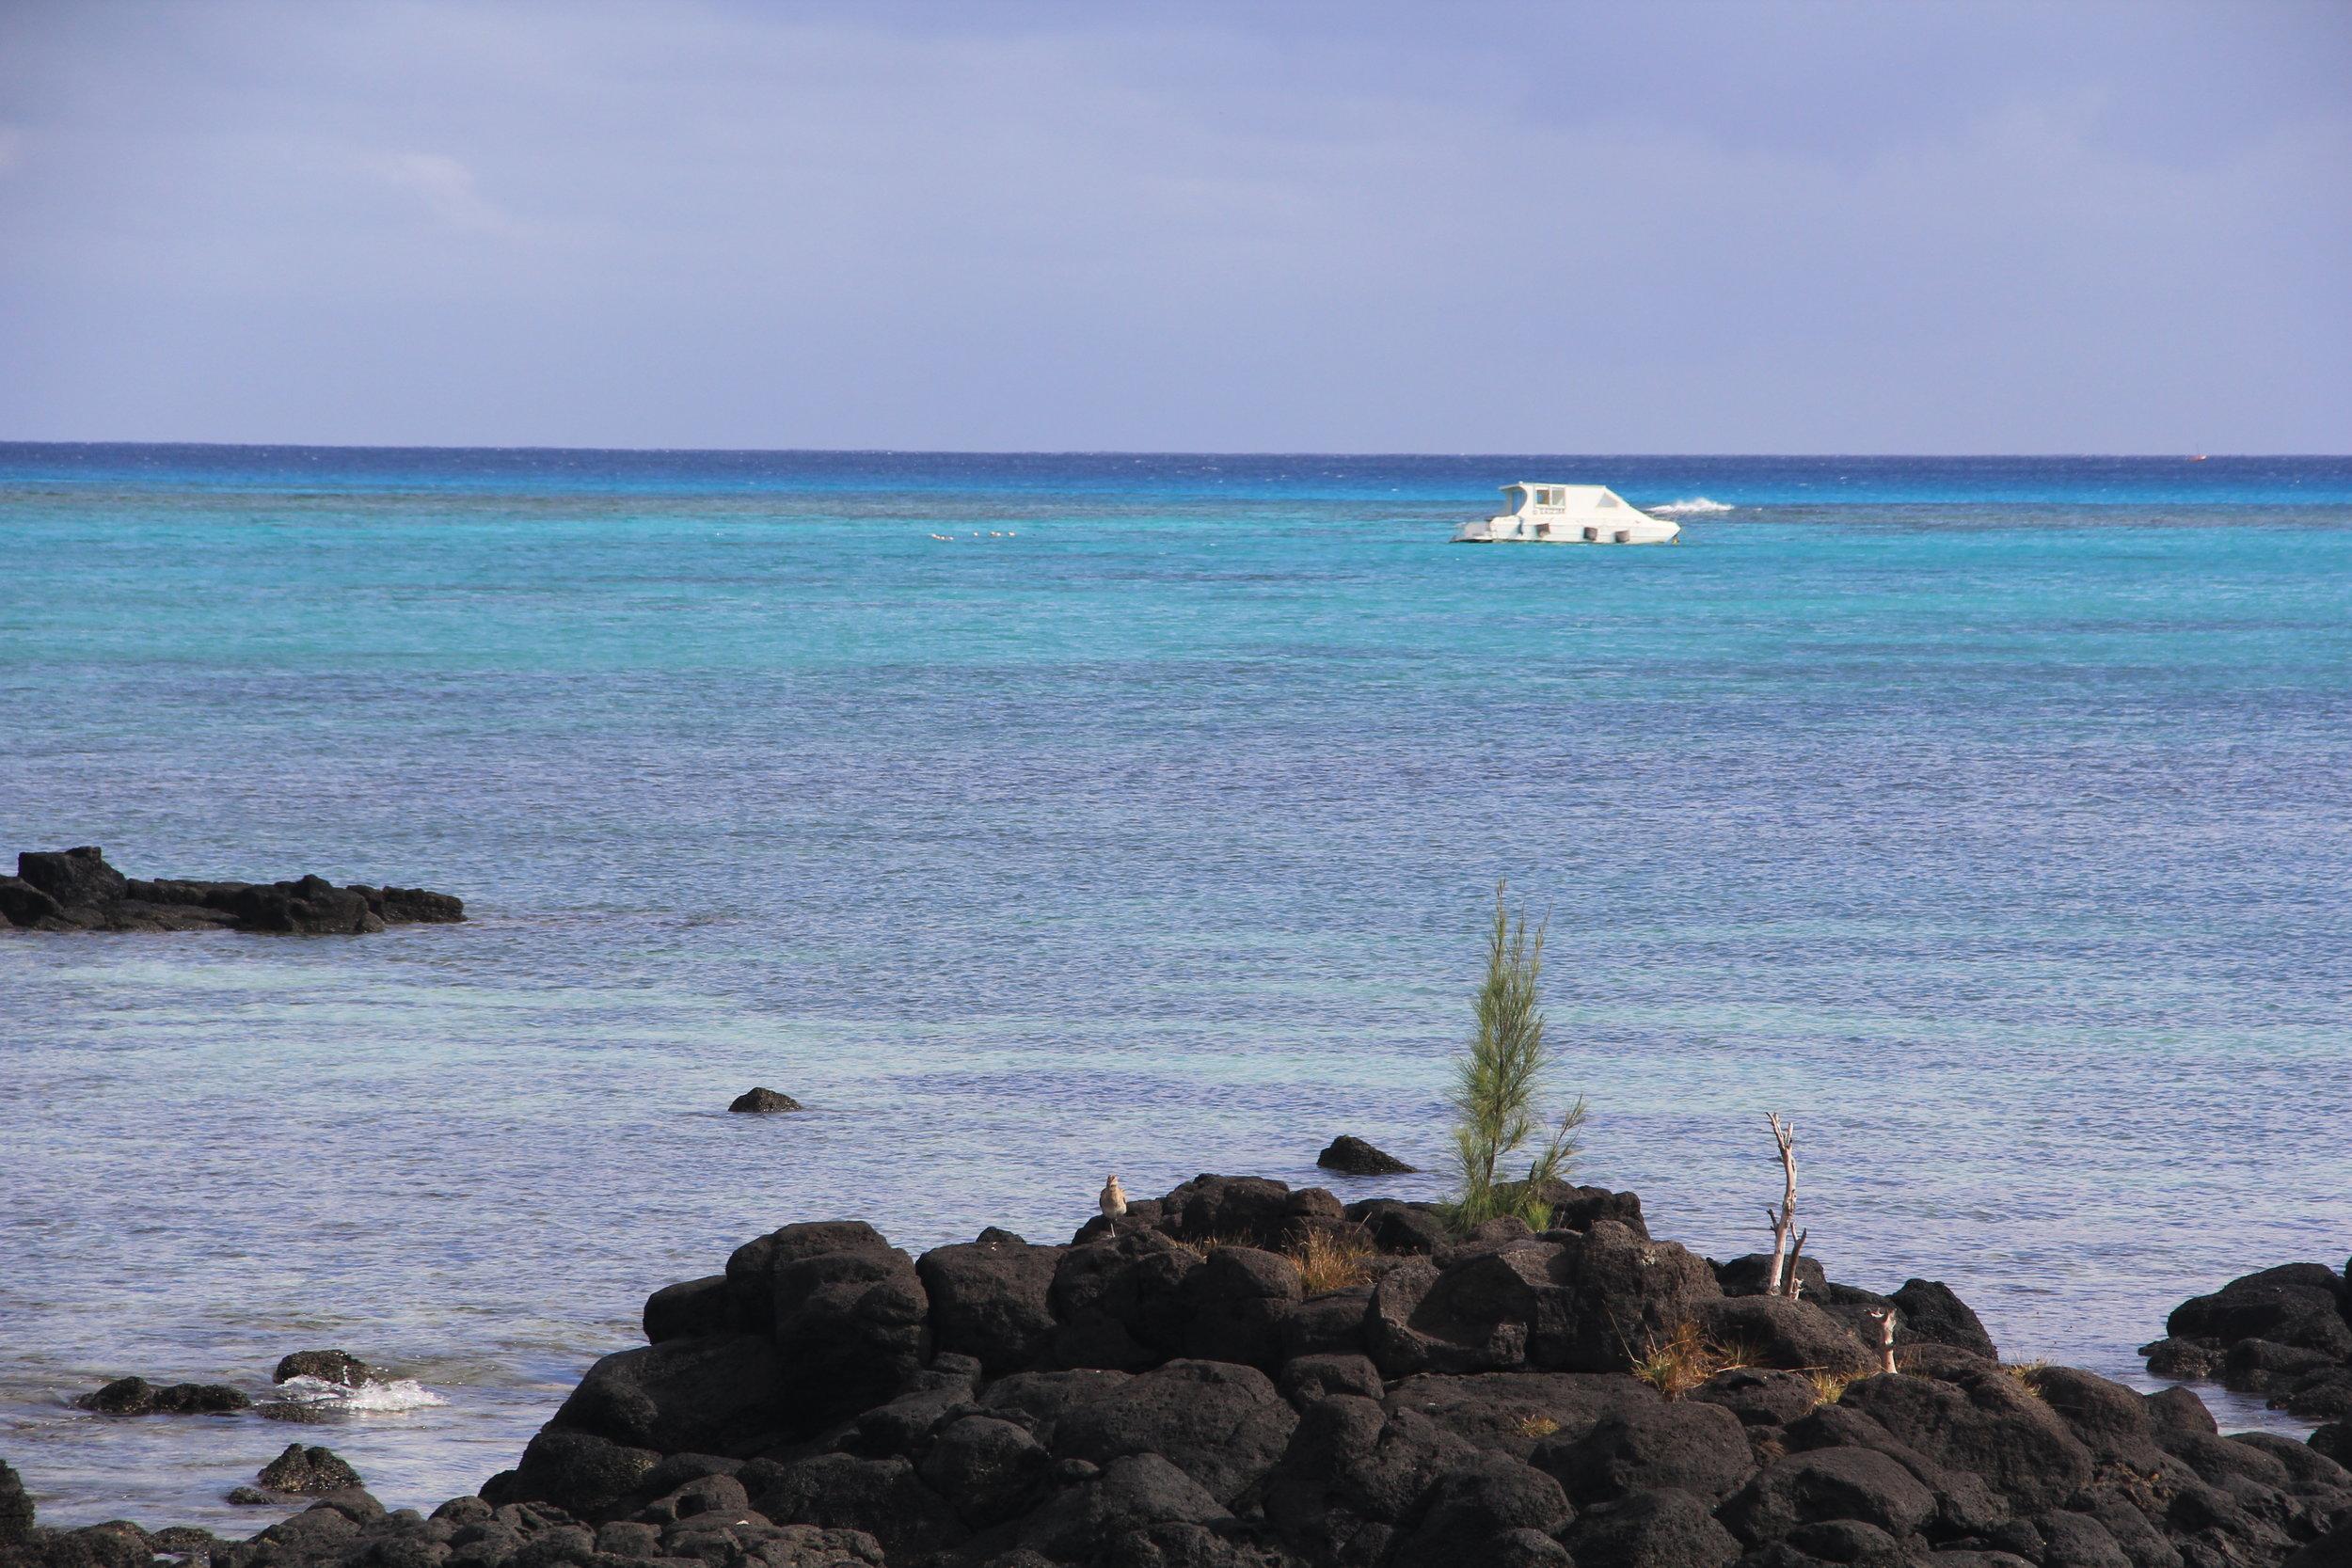 Blue Color palette in the Ocean